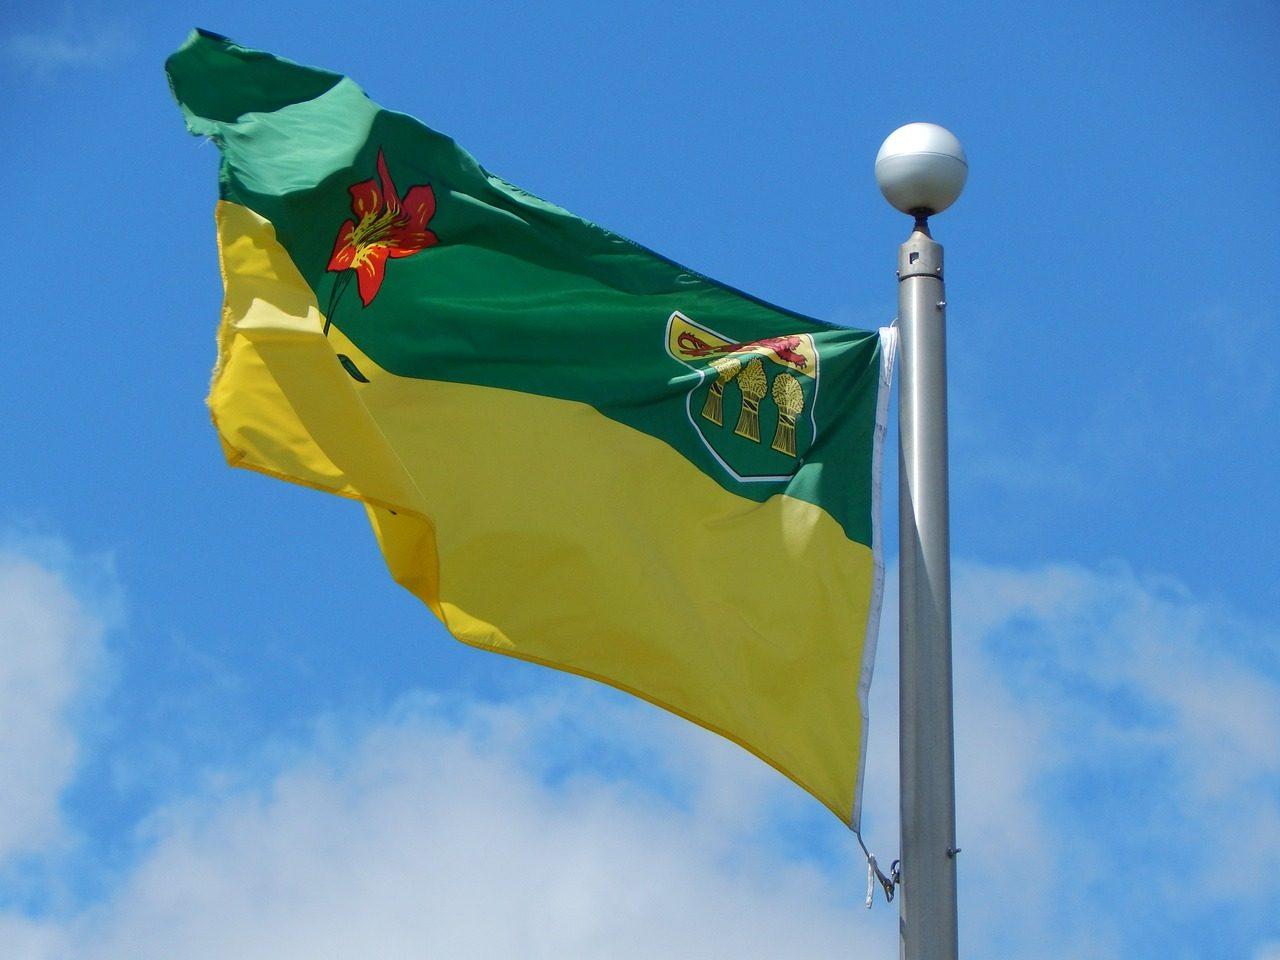 flag-872318_1280-1280x960.jpg